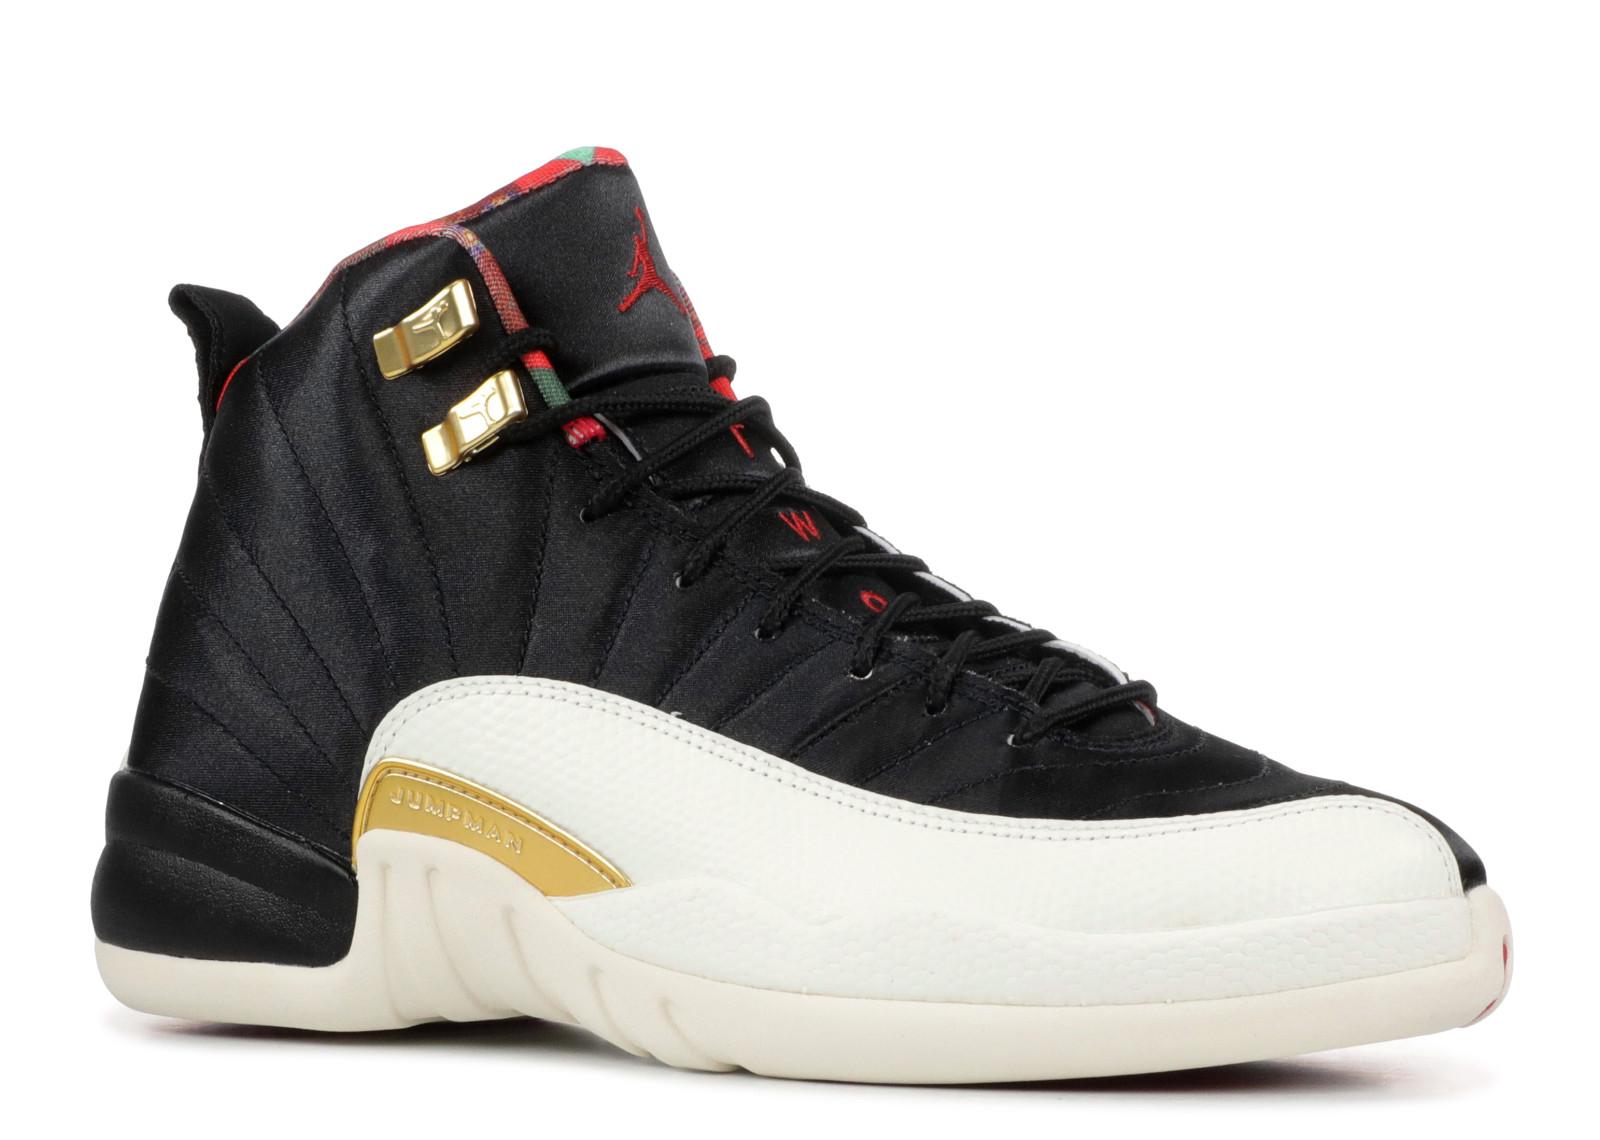 on sale 175c6 aba12 Kick Avenue - Authentic Sneakers